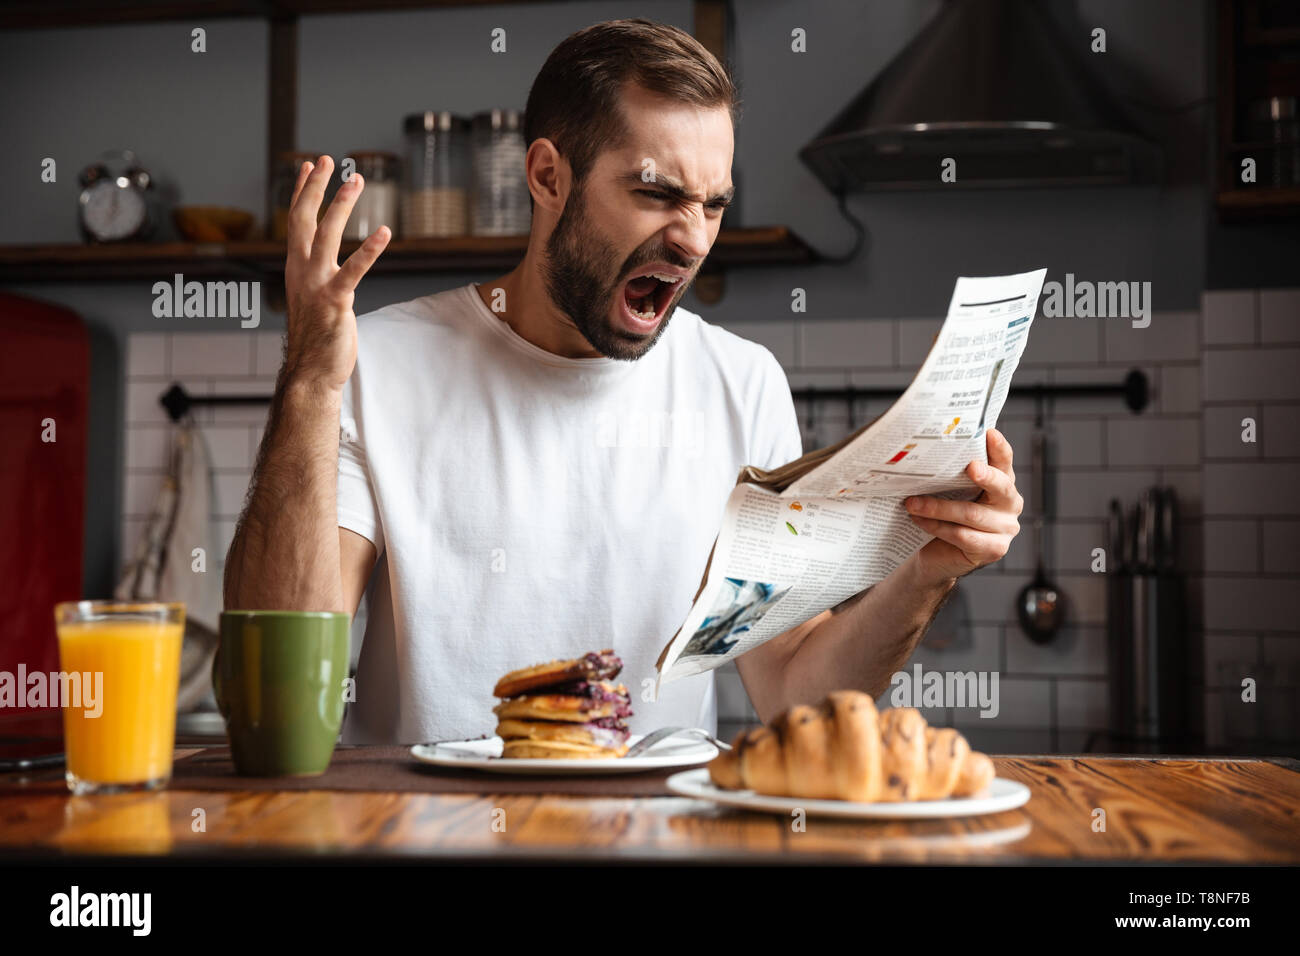 Angry shocked man having breakfast, reading newspaper - Stock Image